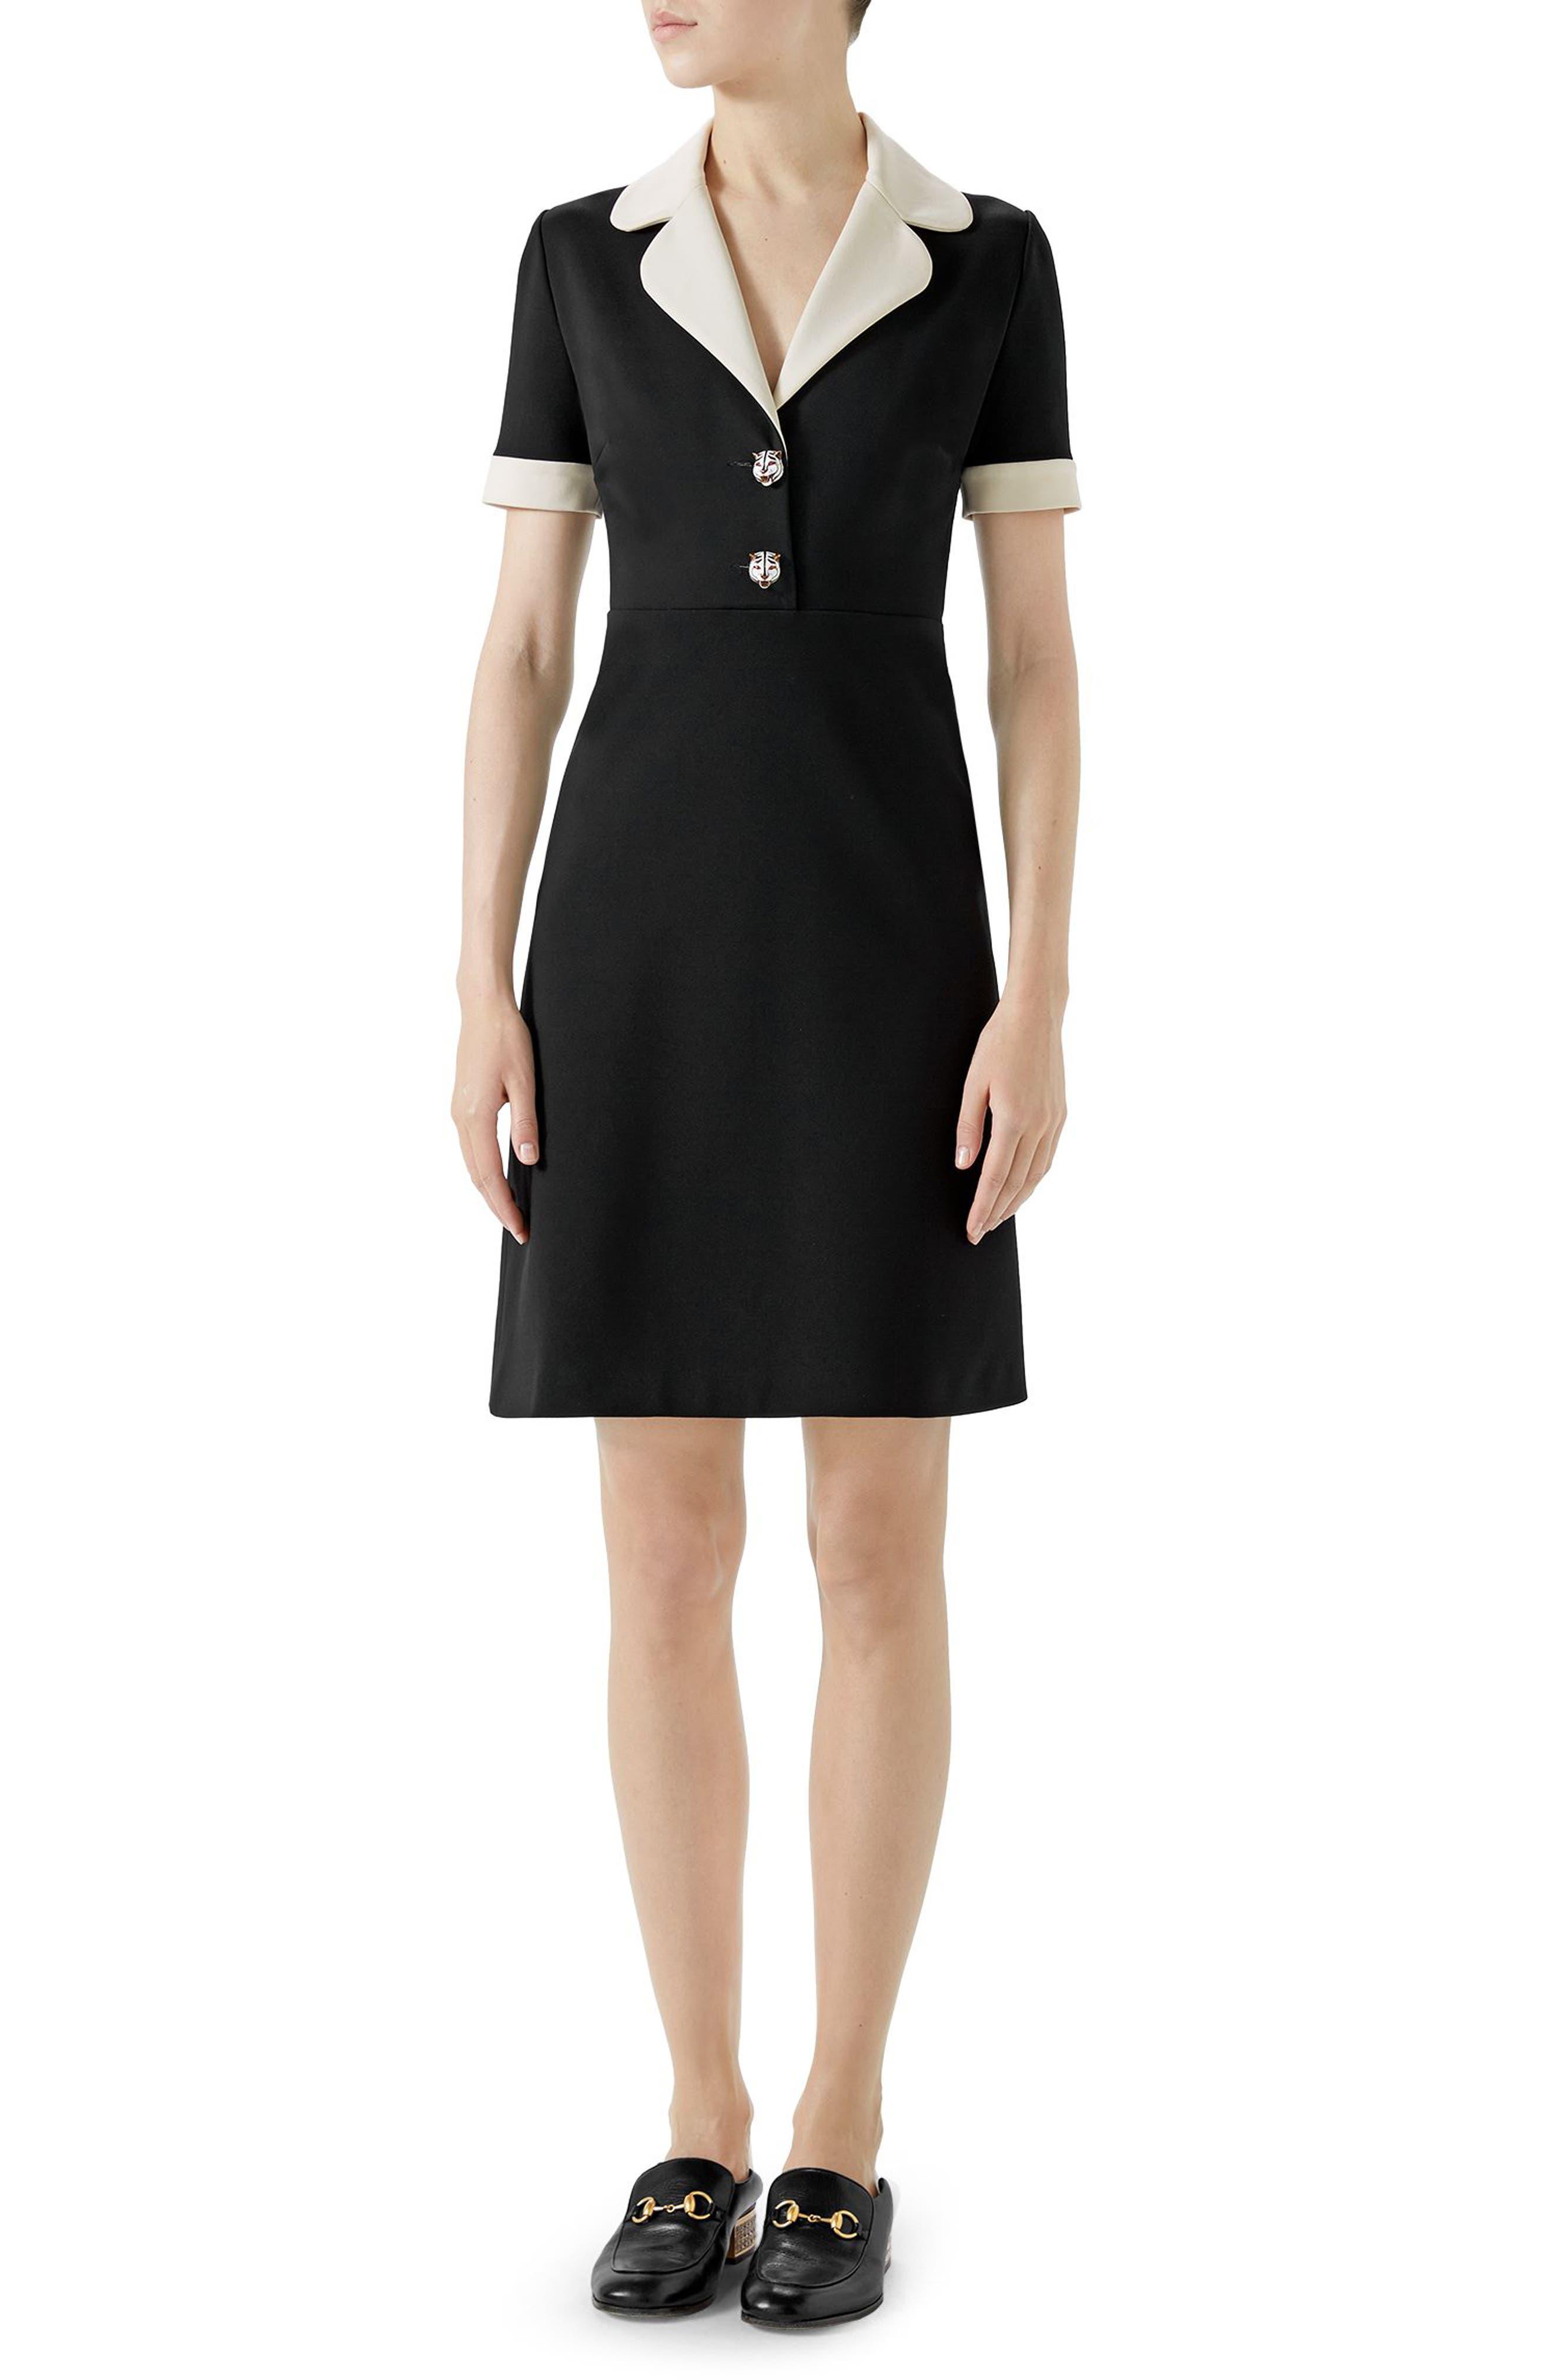 Tiger Button Contrast Trim Jersey Dress,                         Main,                         color, BLACK/ ALMOND FLOWER